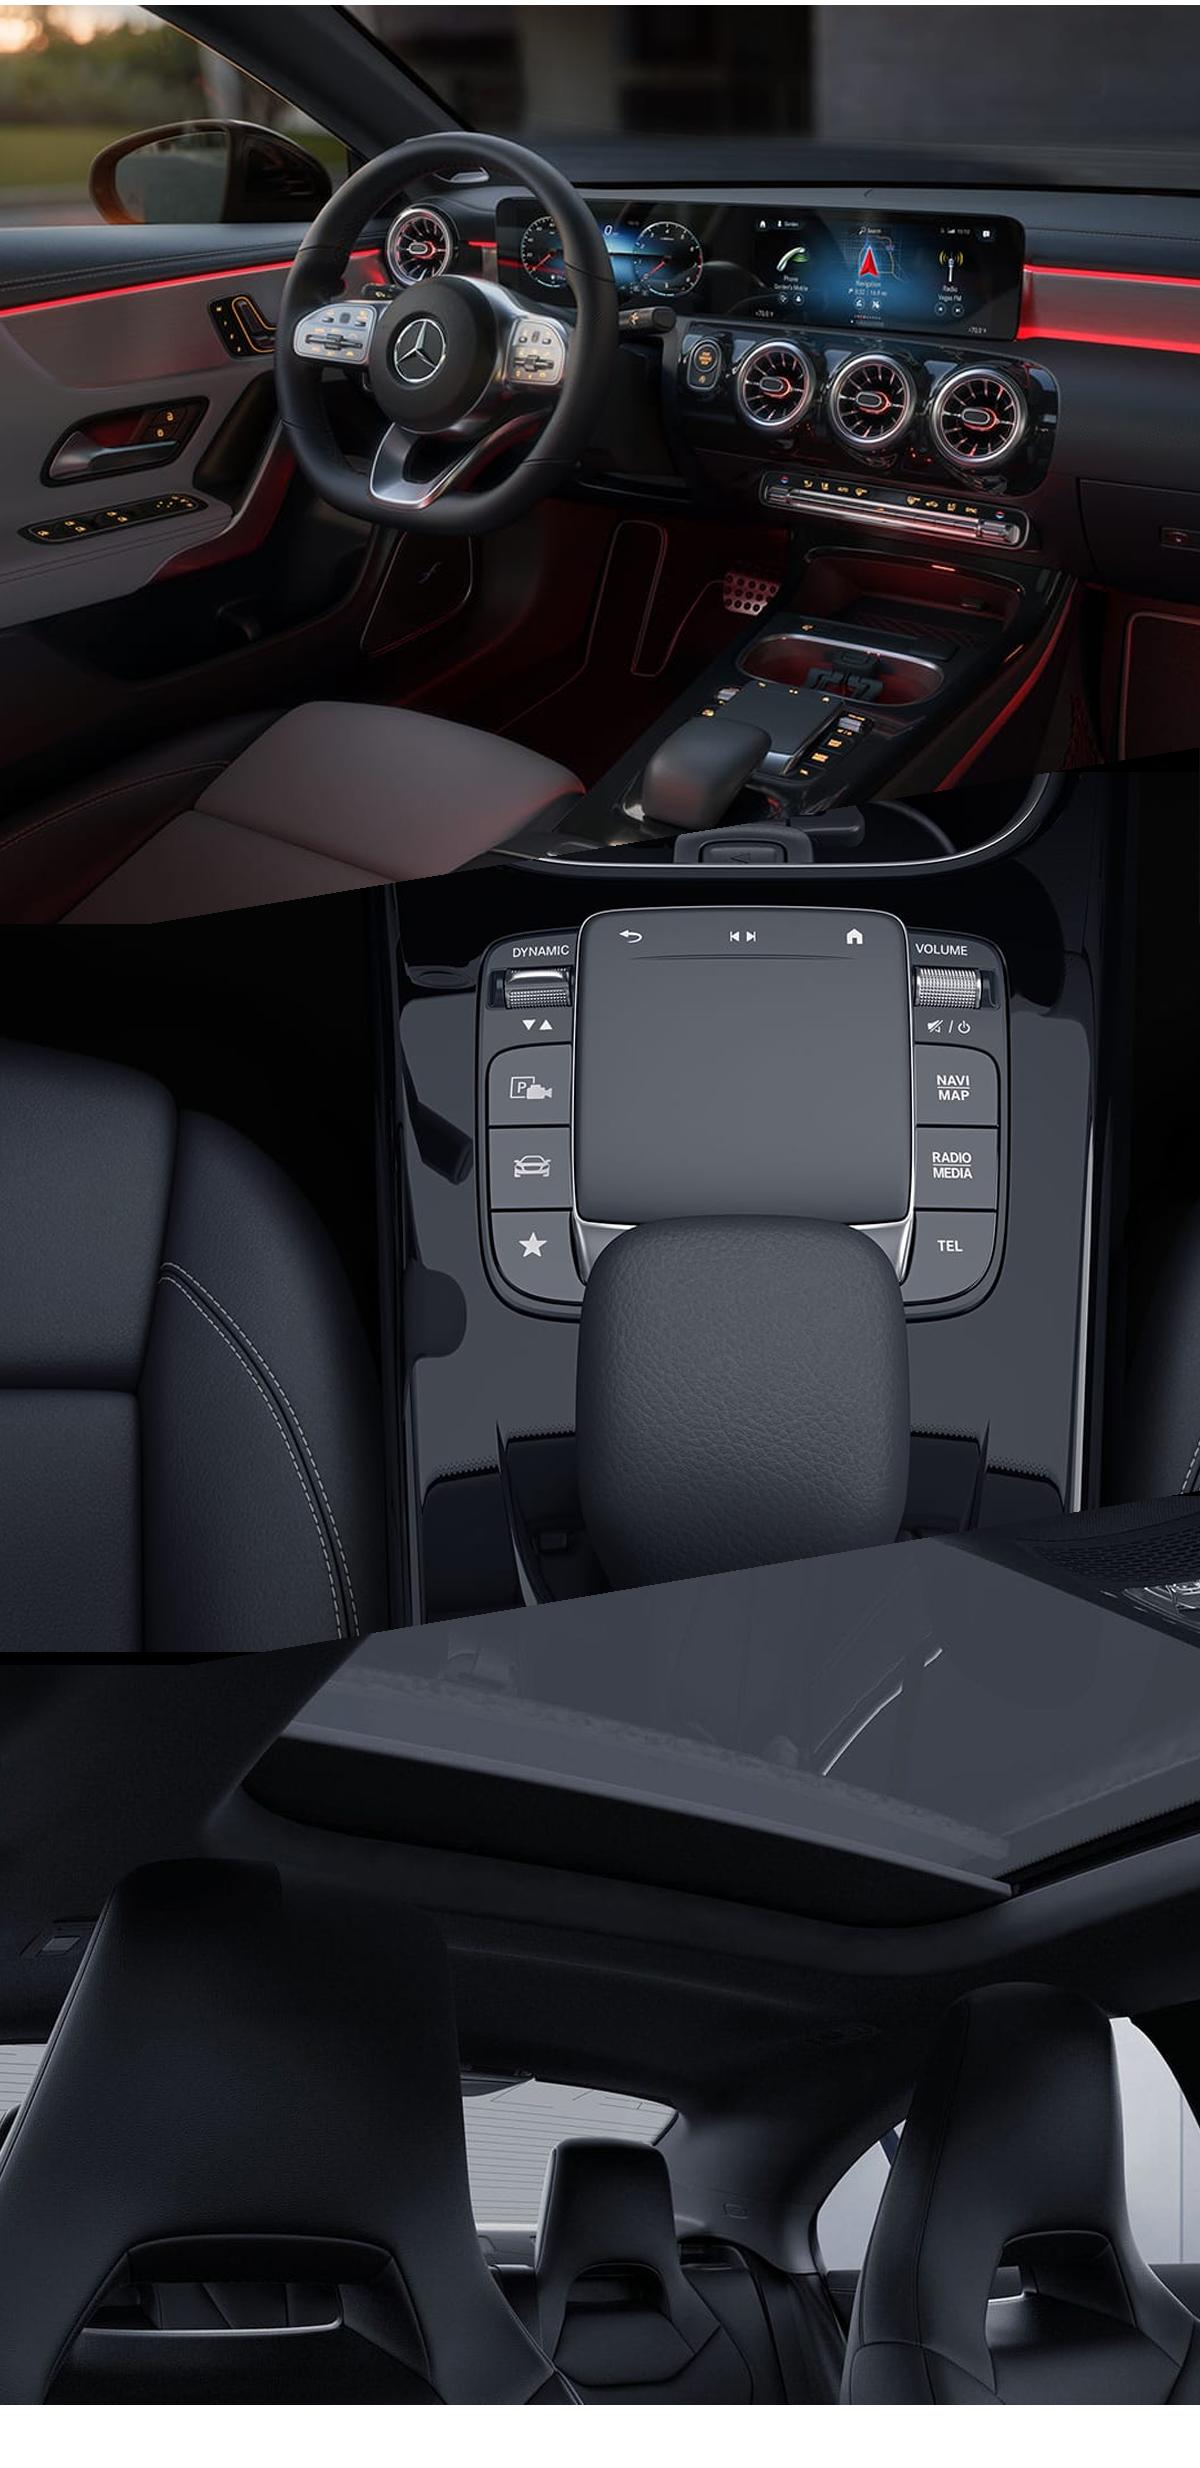 2021 Mercedes-Benz CLA Interior Images